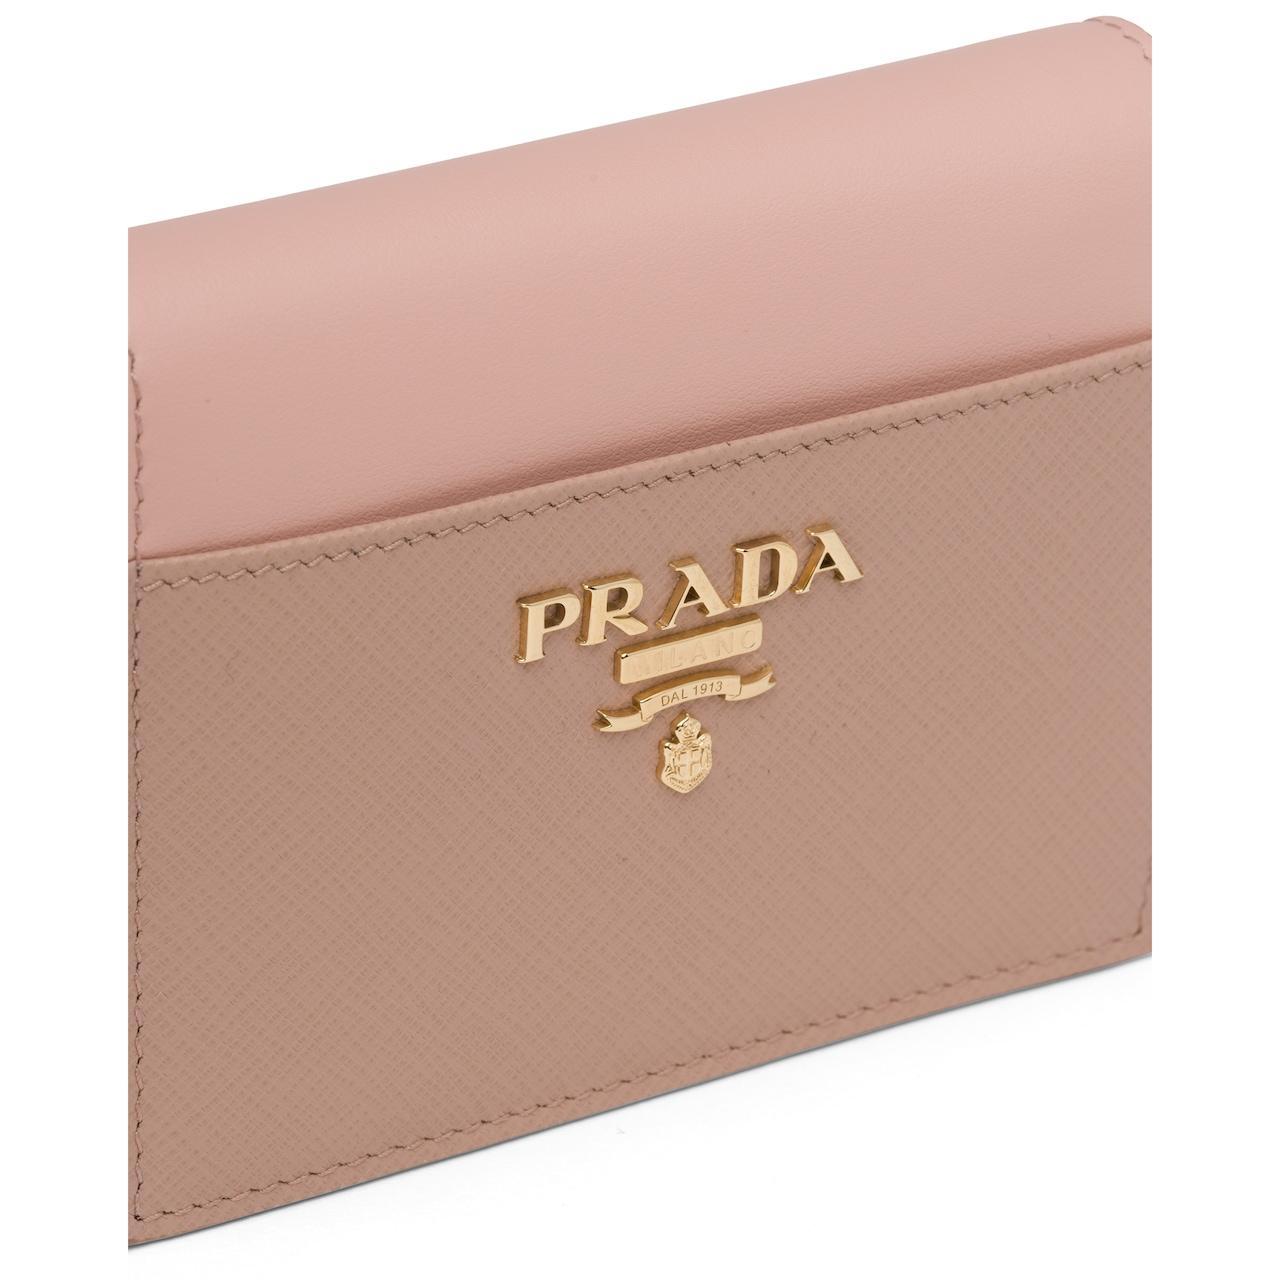 Prada Small leather wallet 6